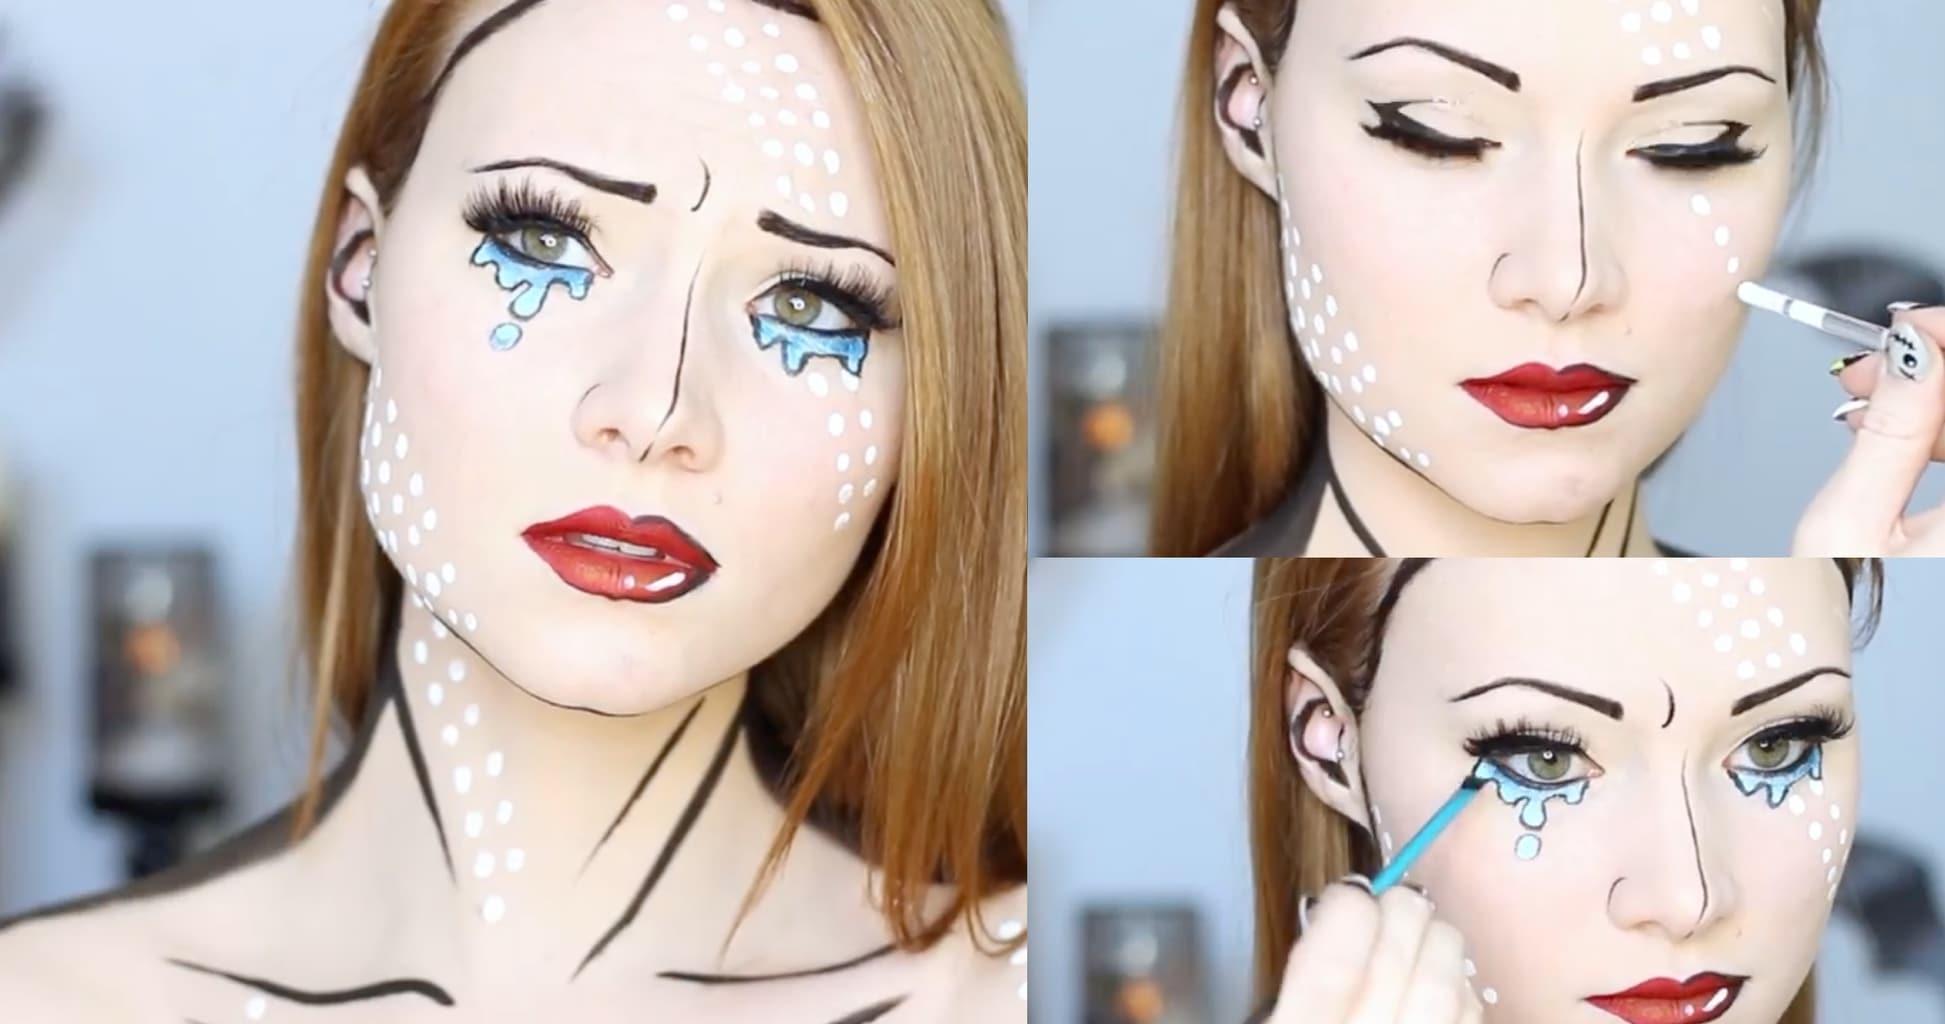 Easy Halloween makeup ideas: Pop art makeup with tears